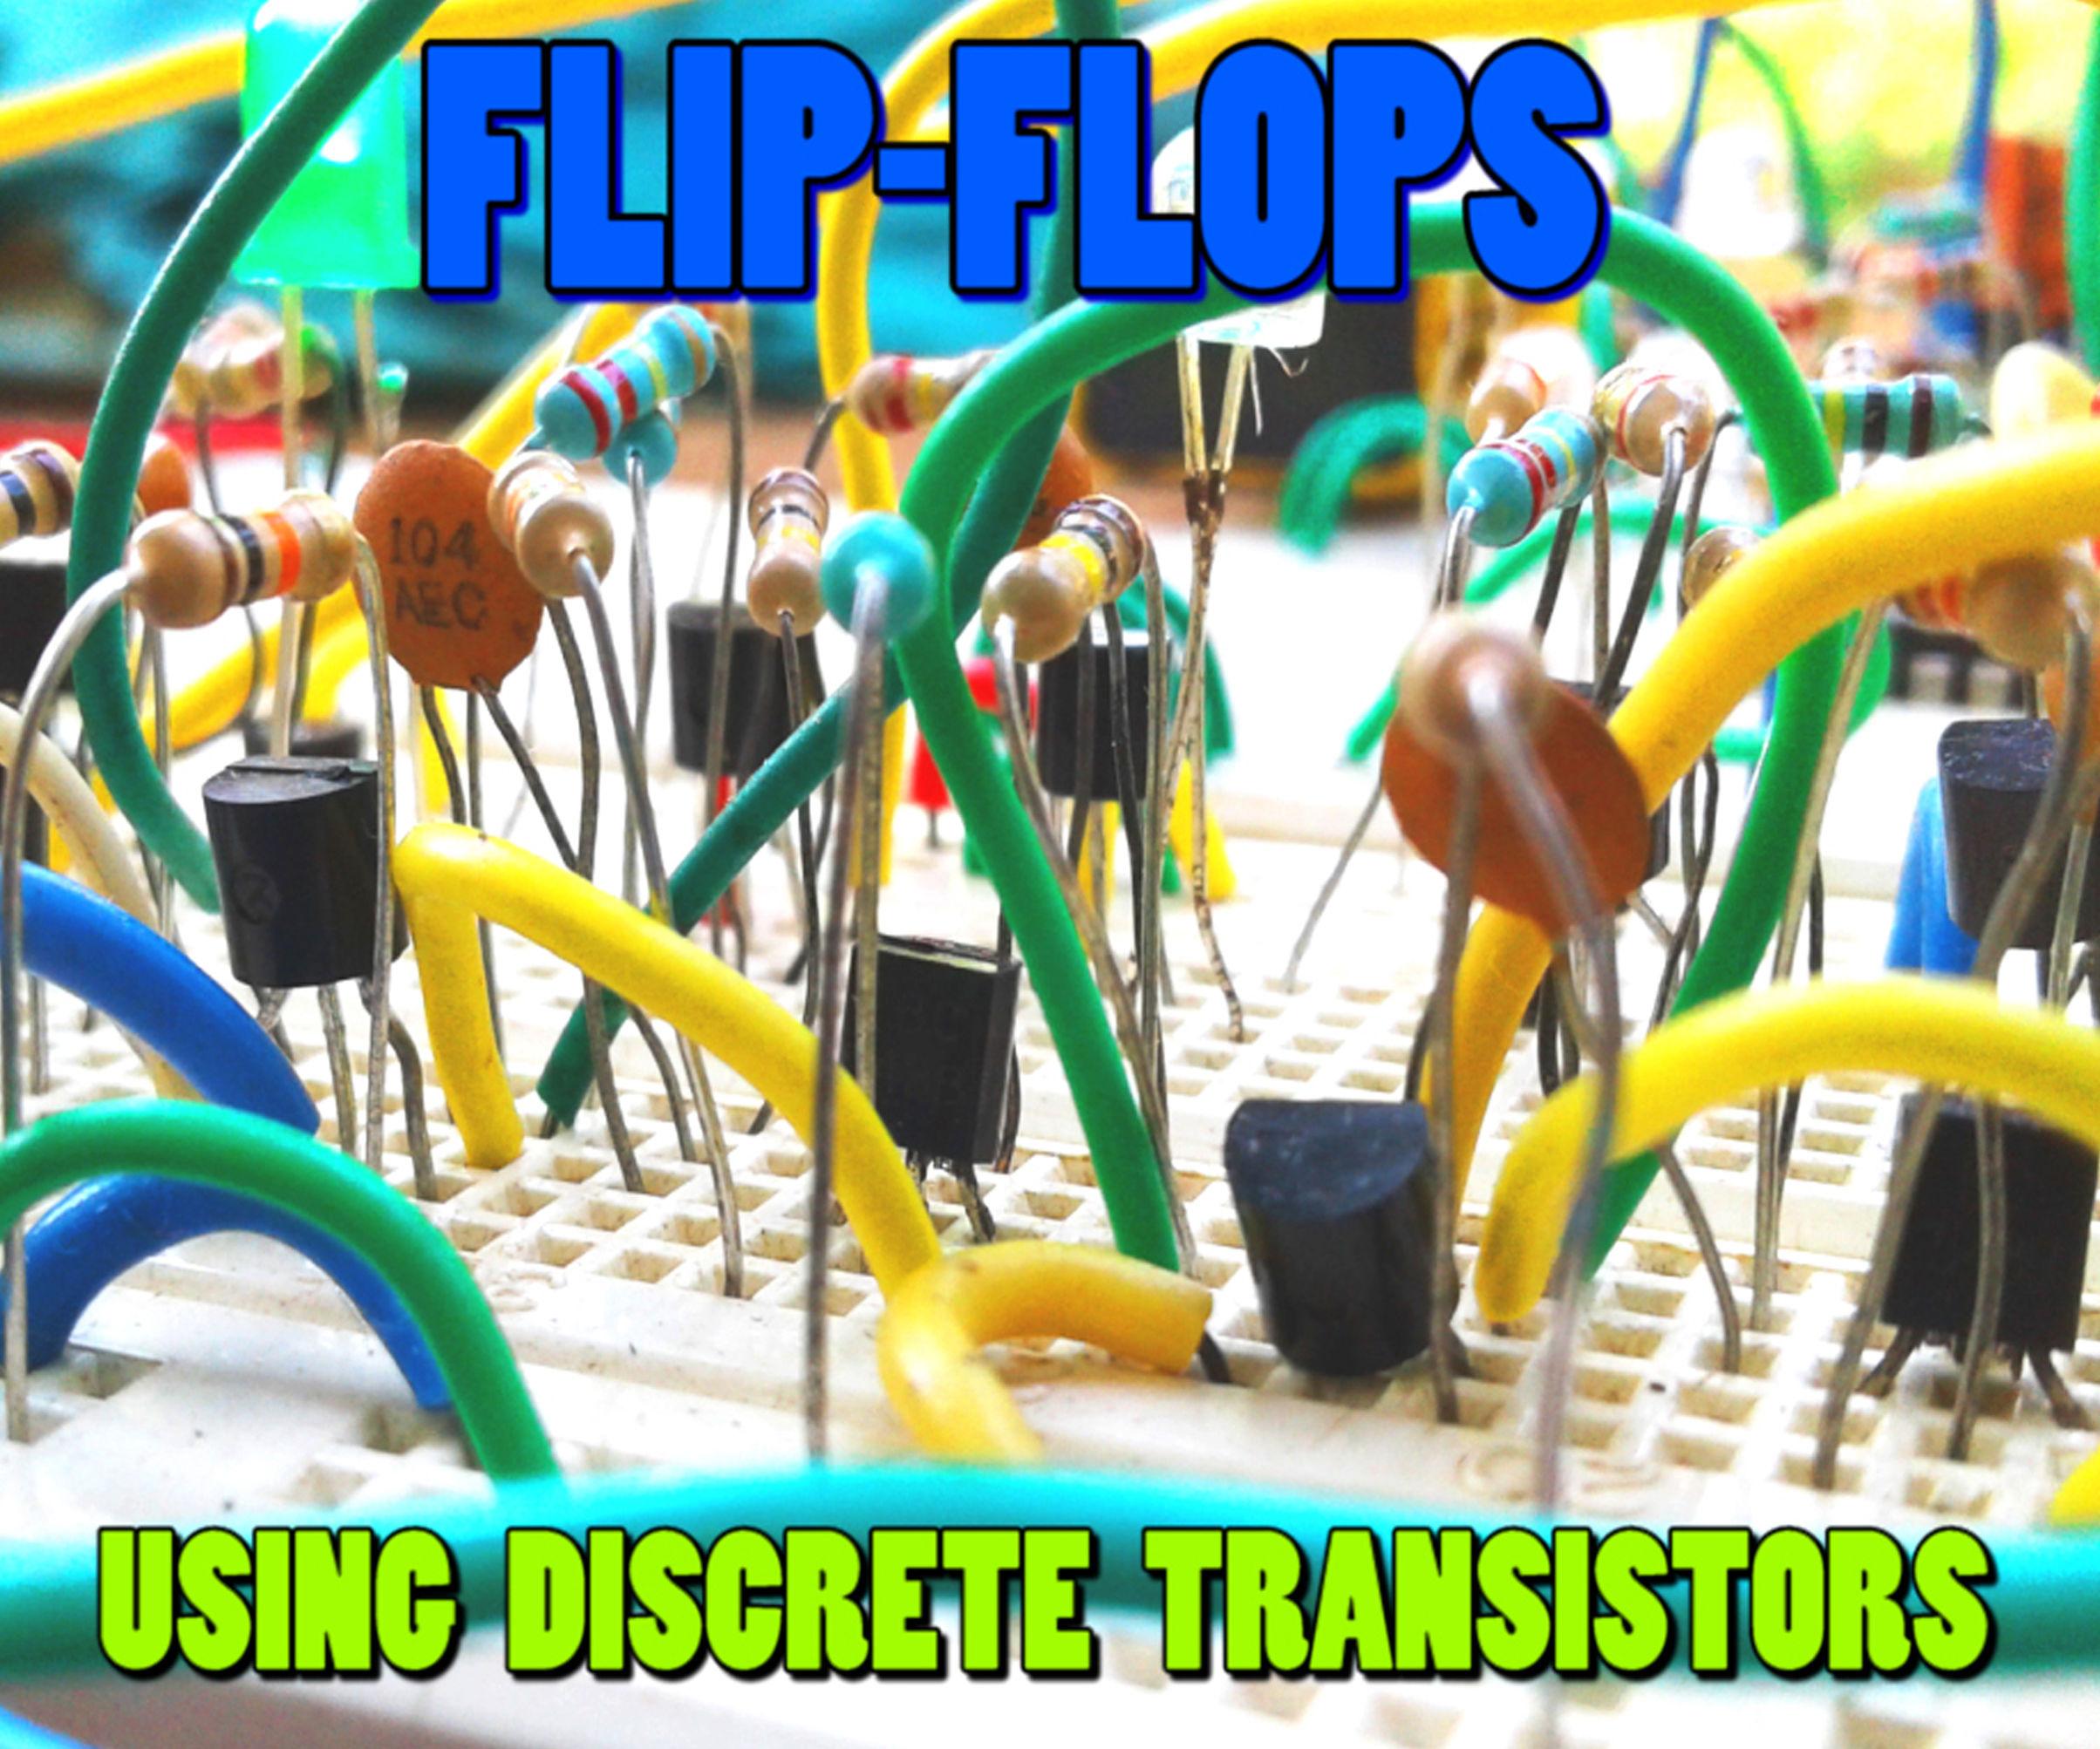 Flip-Flops Using Discrete Transistors